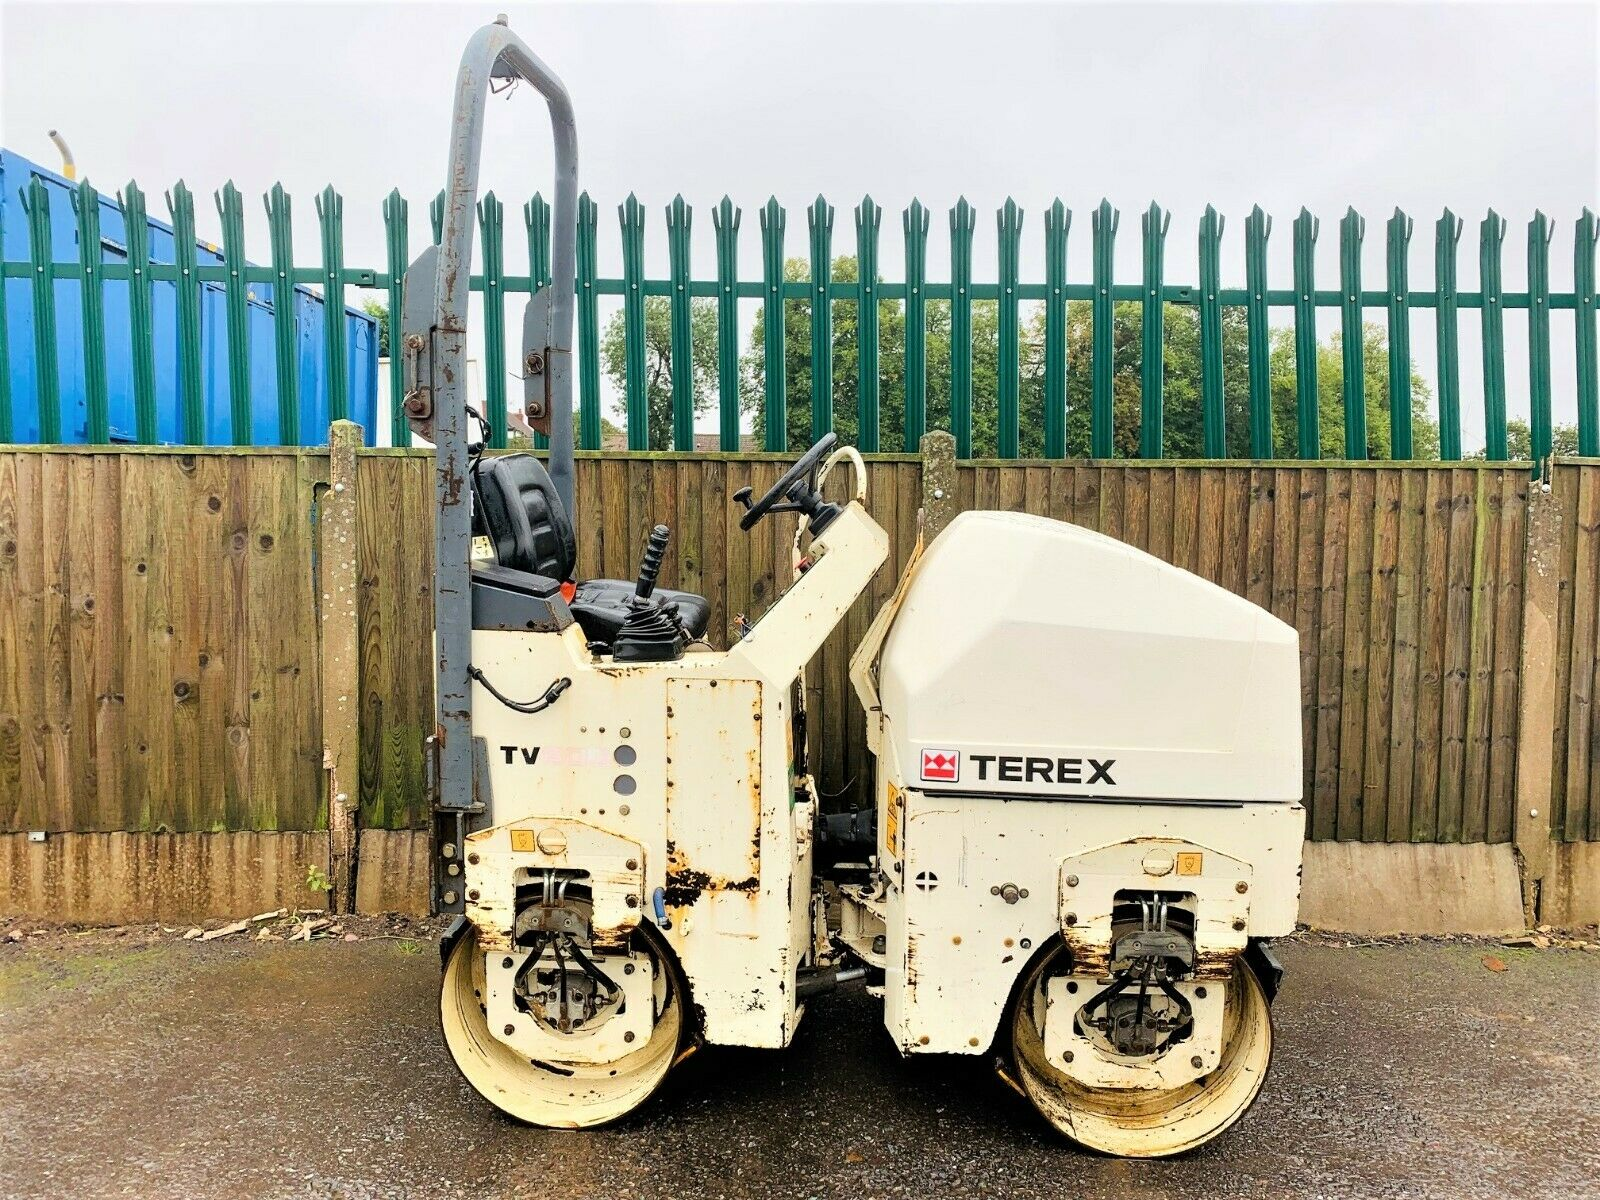 Lot 29 - Terex TV800 KRF Tandem Roller